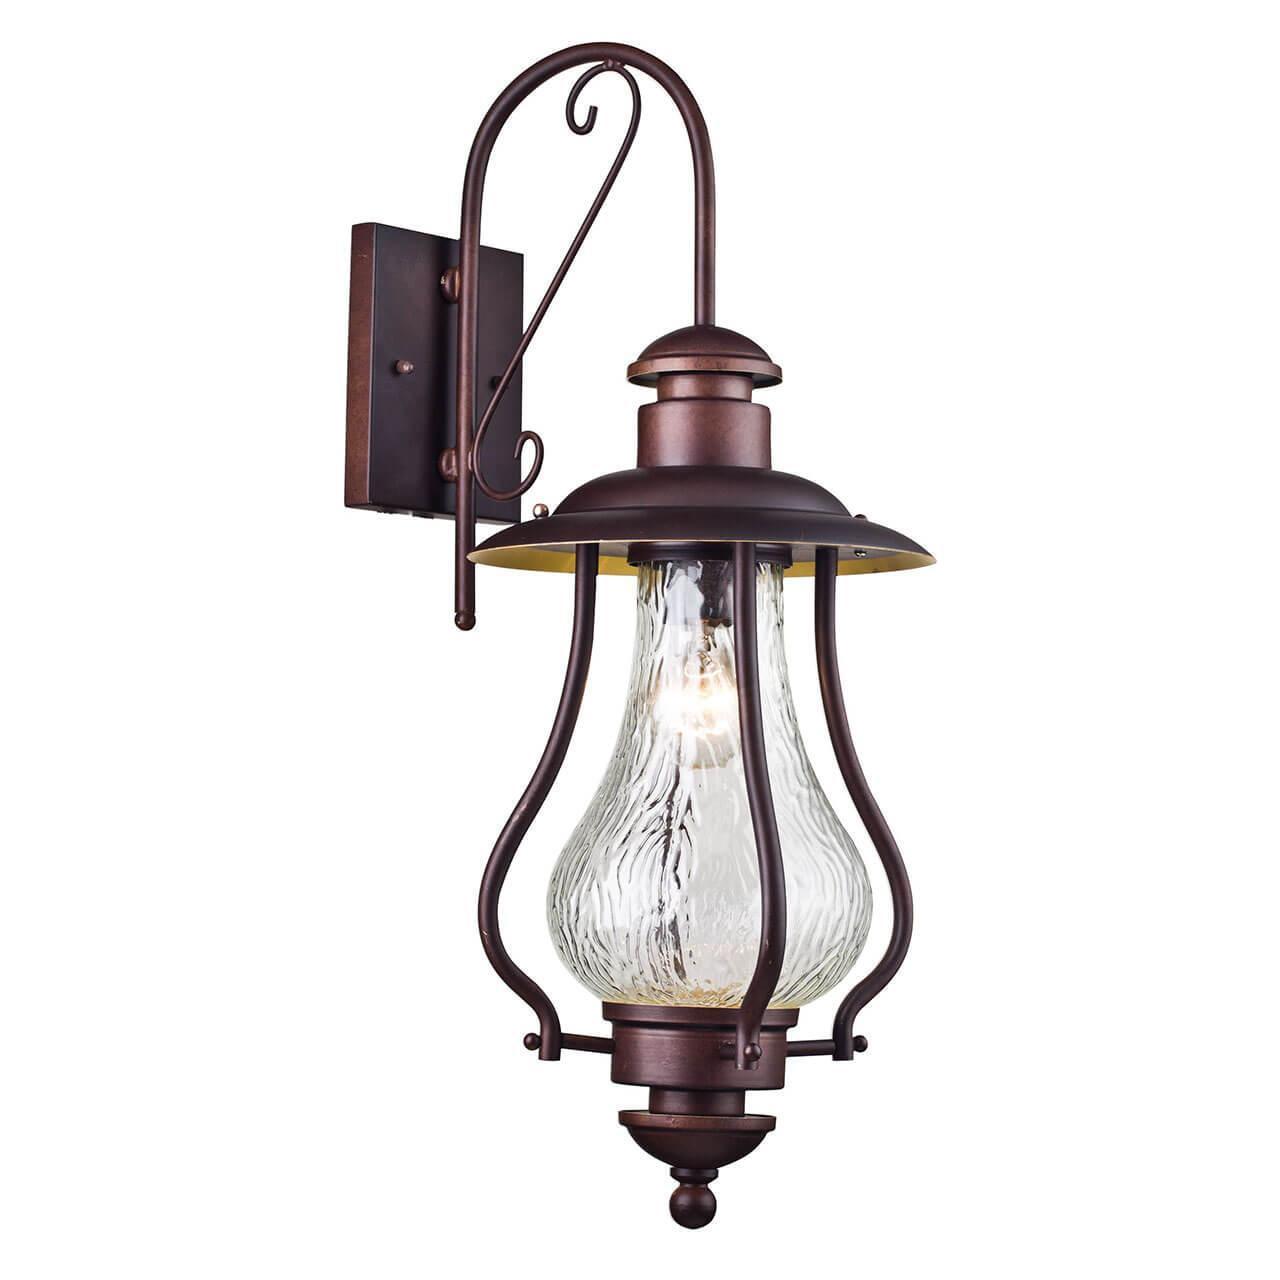 Уличный светильник Maytoni S104-60-01-R, E27